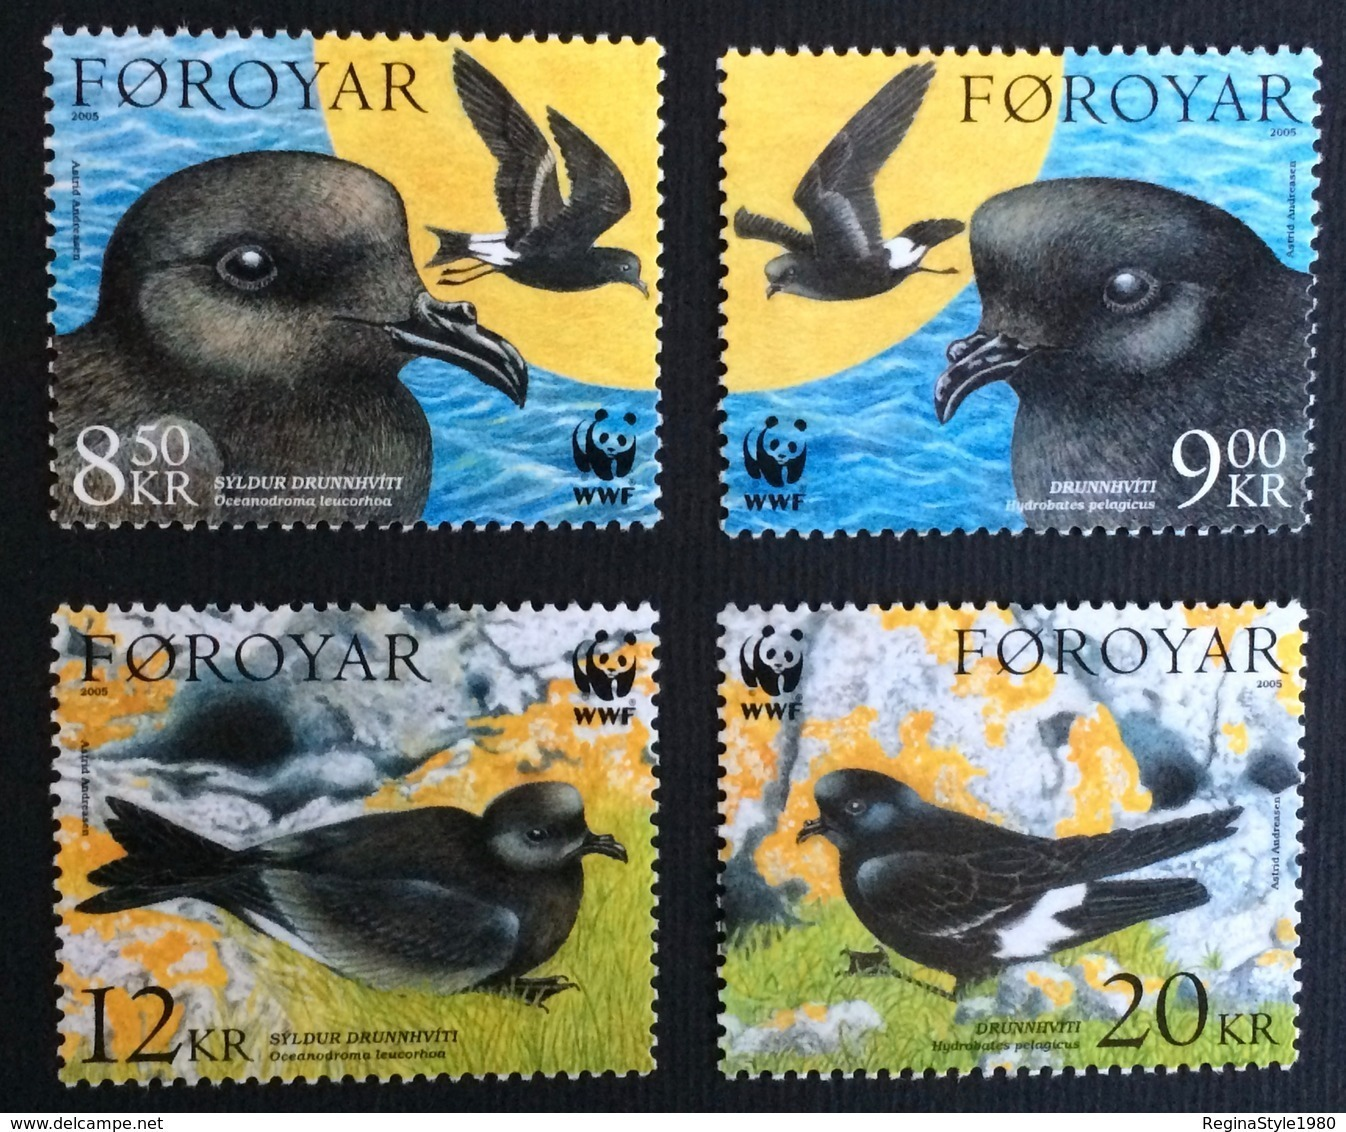 Faroe Islands 2005; WWF  Wild Animals, Fauna, Birds; MNH** VF; CV 22 Euro!! - W.W.F.